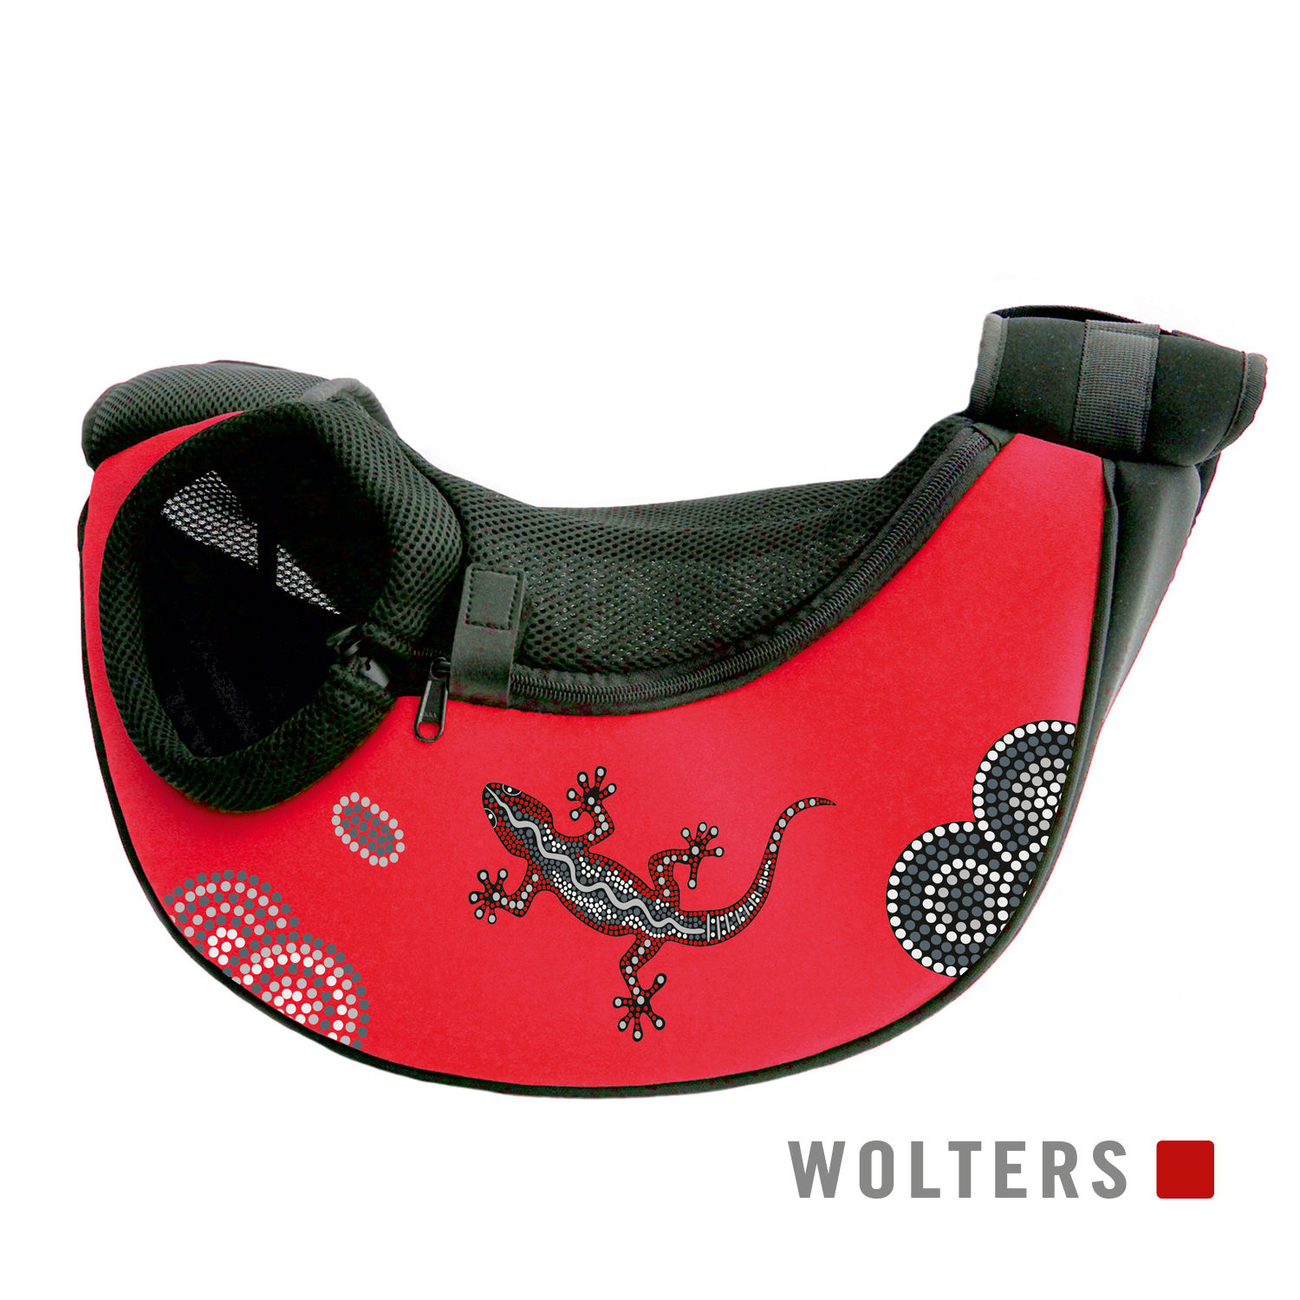 Wolters Bodypack Sunset Hundetasche, Bild 6